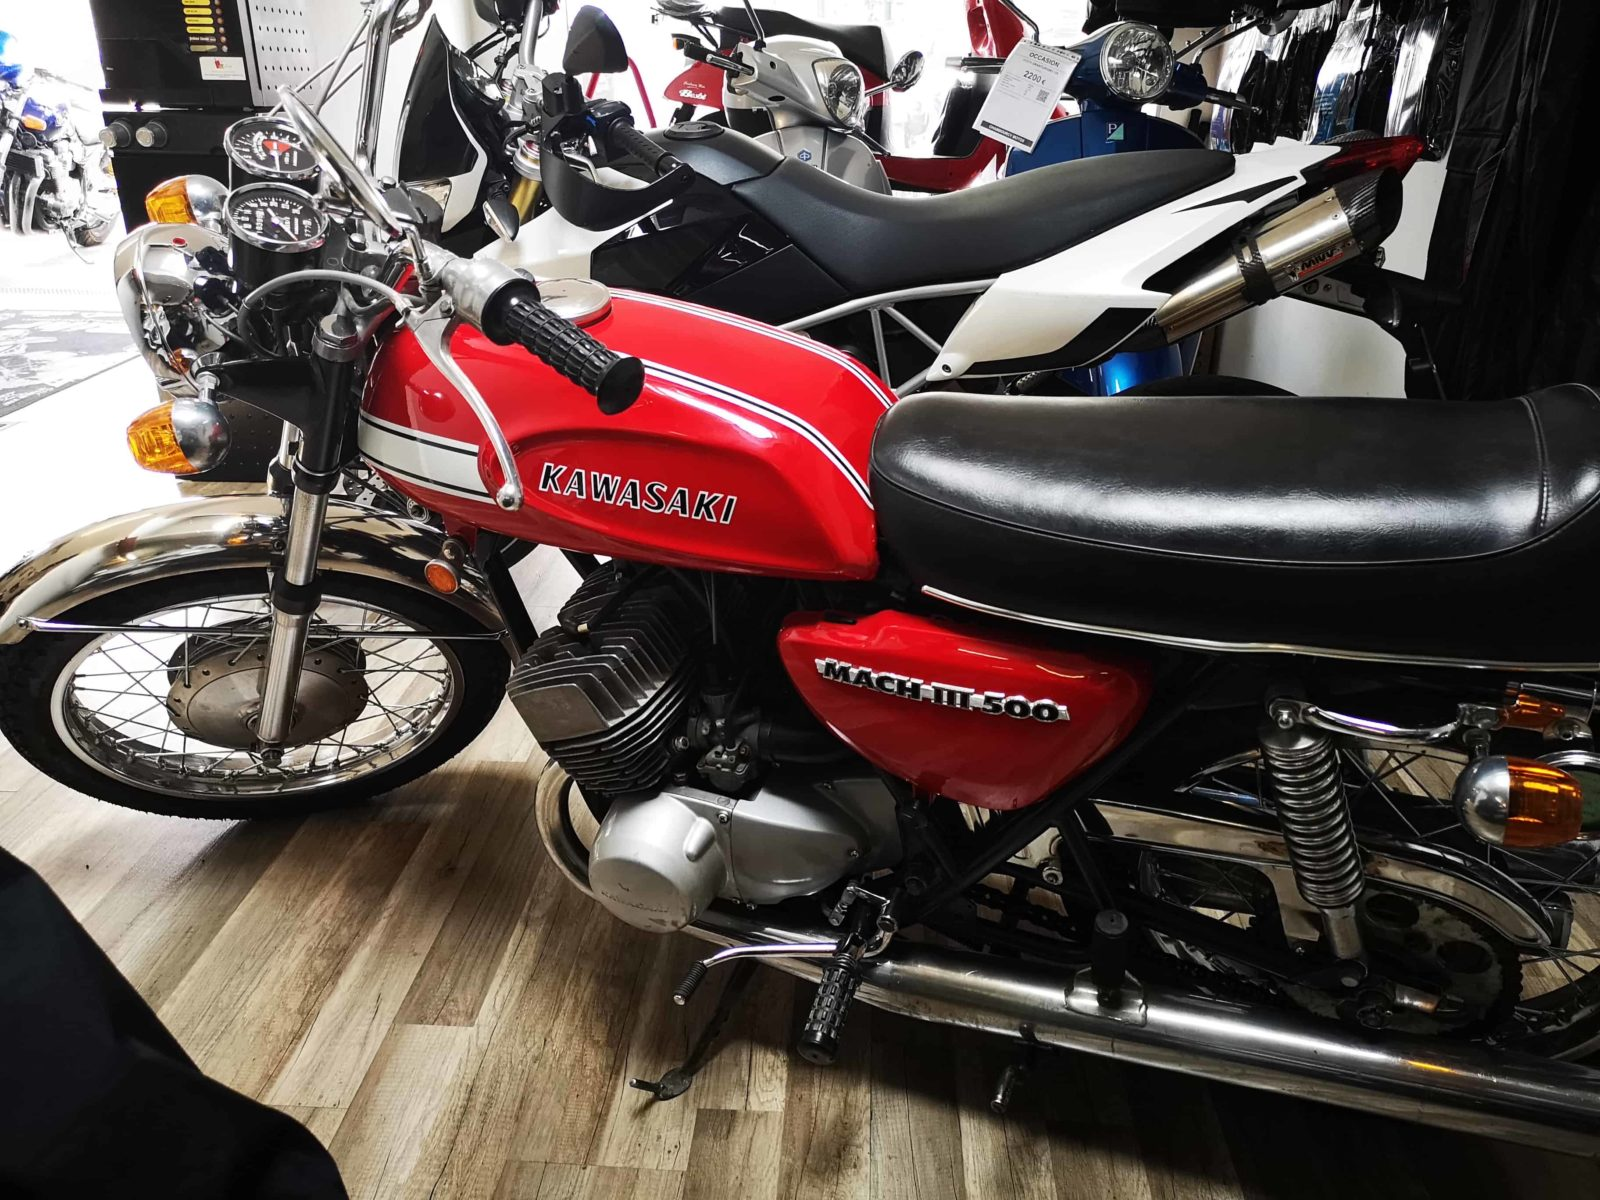 Kawasaki H1 mach 3 - Chambourcy Motos